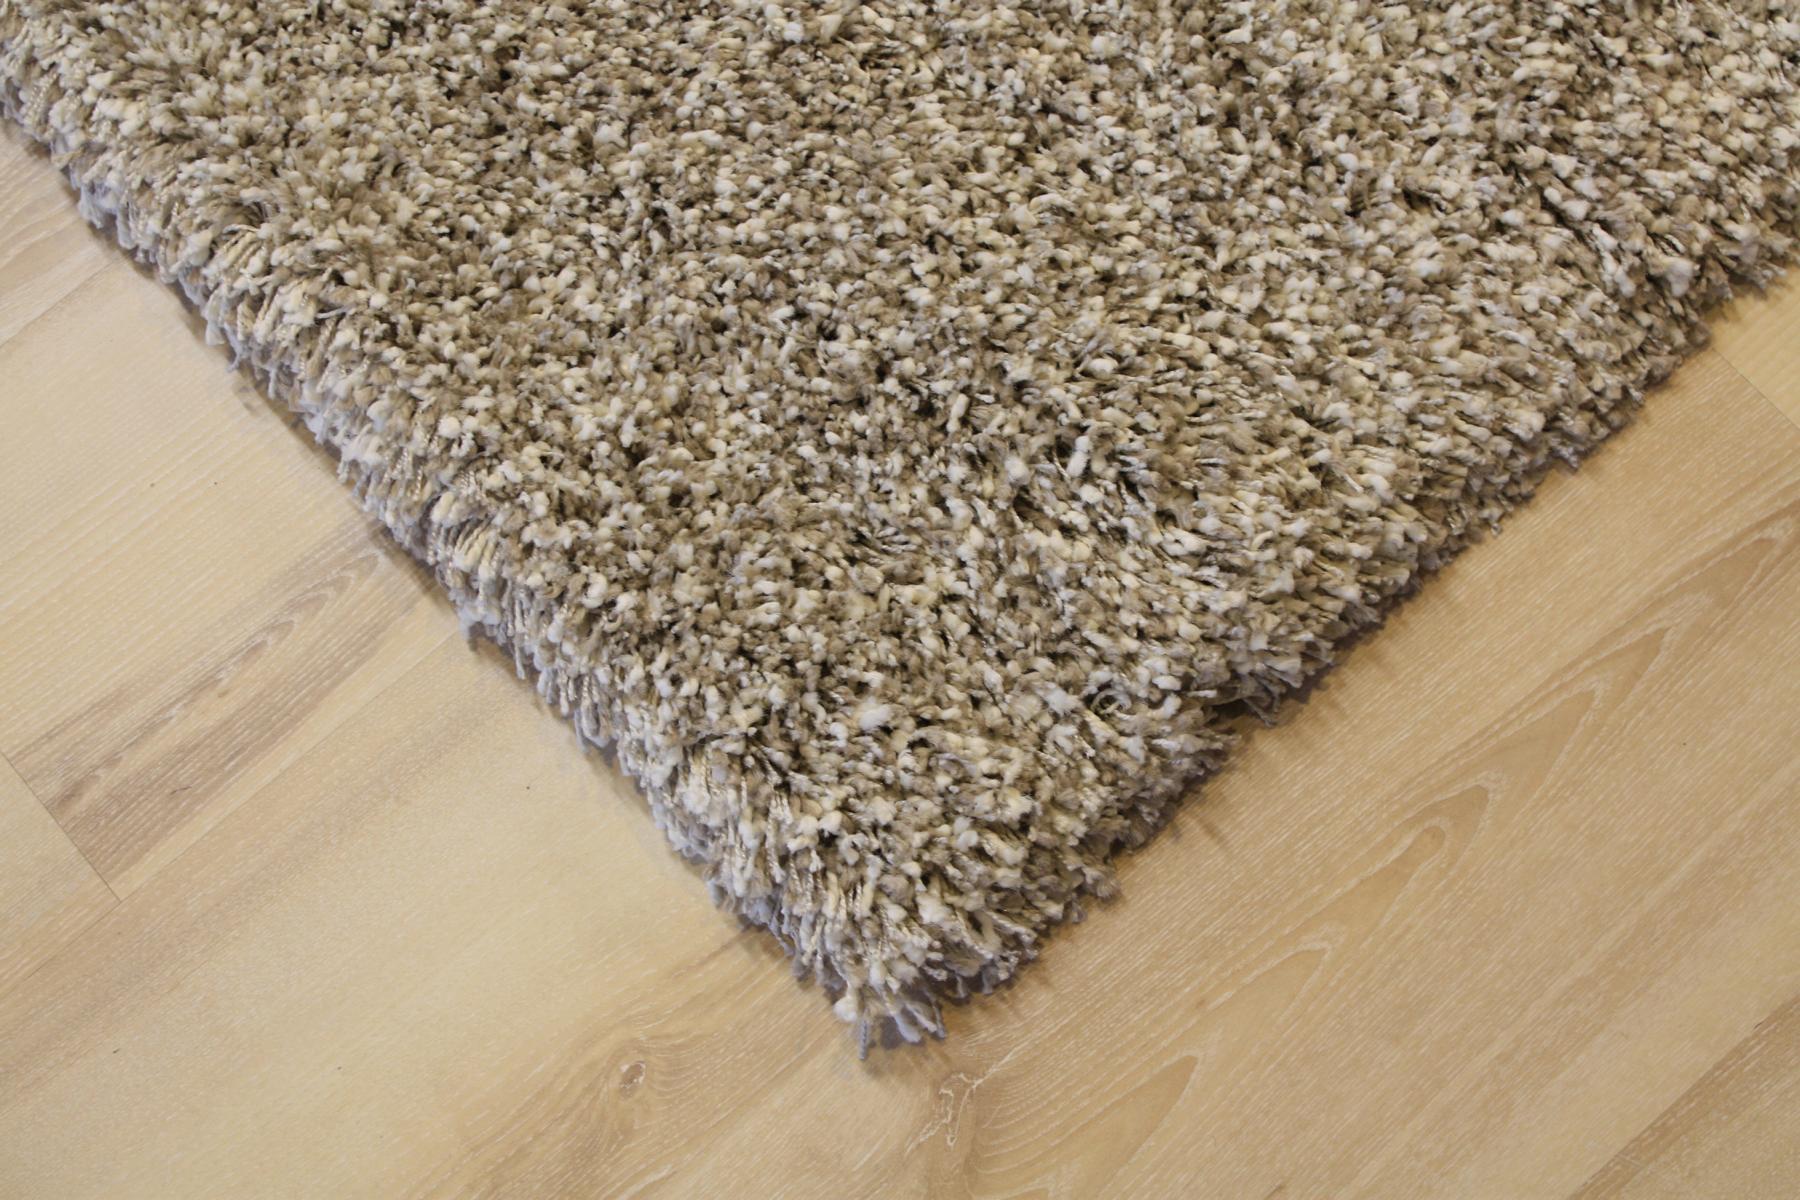 teppich langflor 39001 twilight 2211 white linen 65x130cm ebay. Black Bedroom Furniture Sets. Home Design Ideas